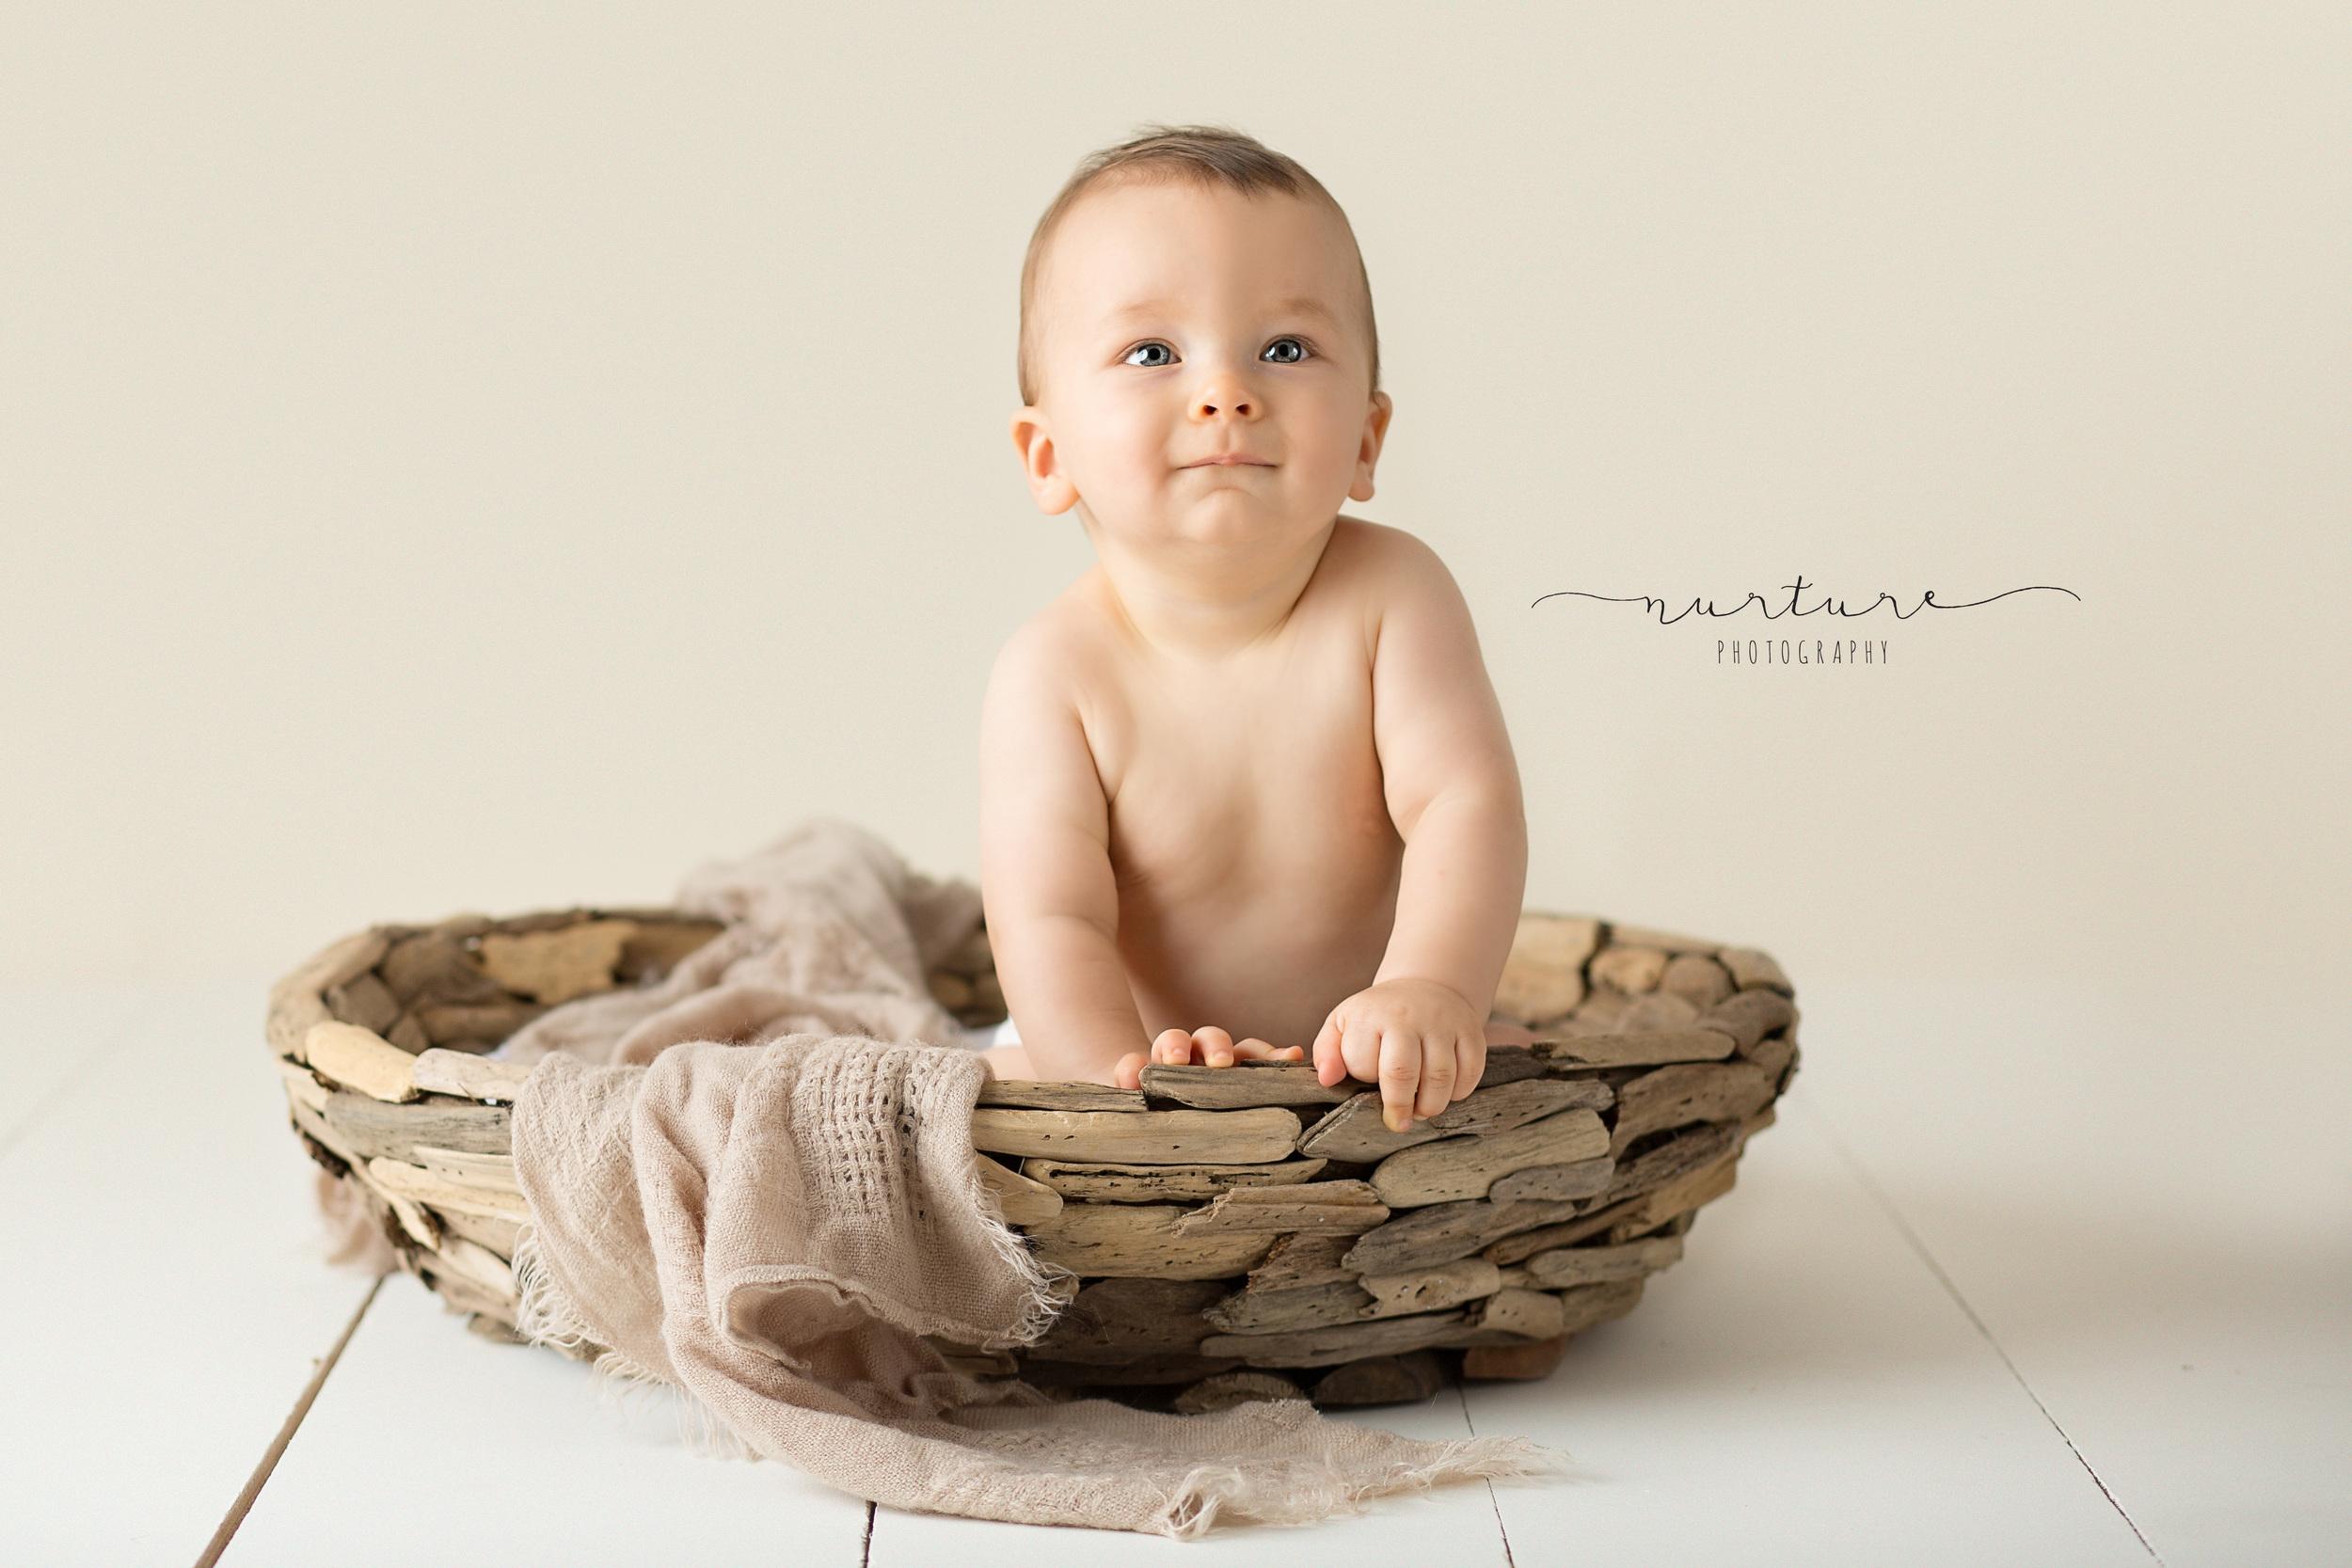 torrance-redondobeach-hermosabeach-manhattanbeach-palosverdes-southbay-photographer-newborn-baby-newbornphotographer-nurturephotography-babyphotographer-newbornphotographer0601.jpg